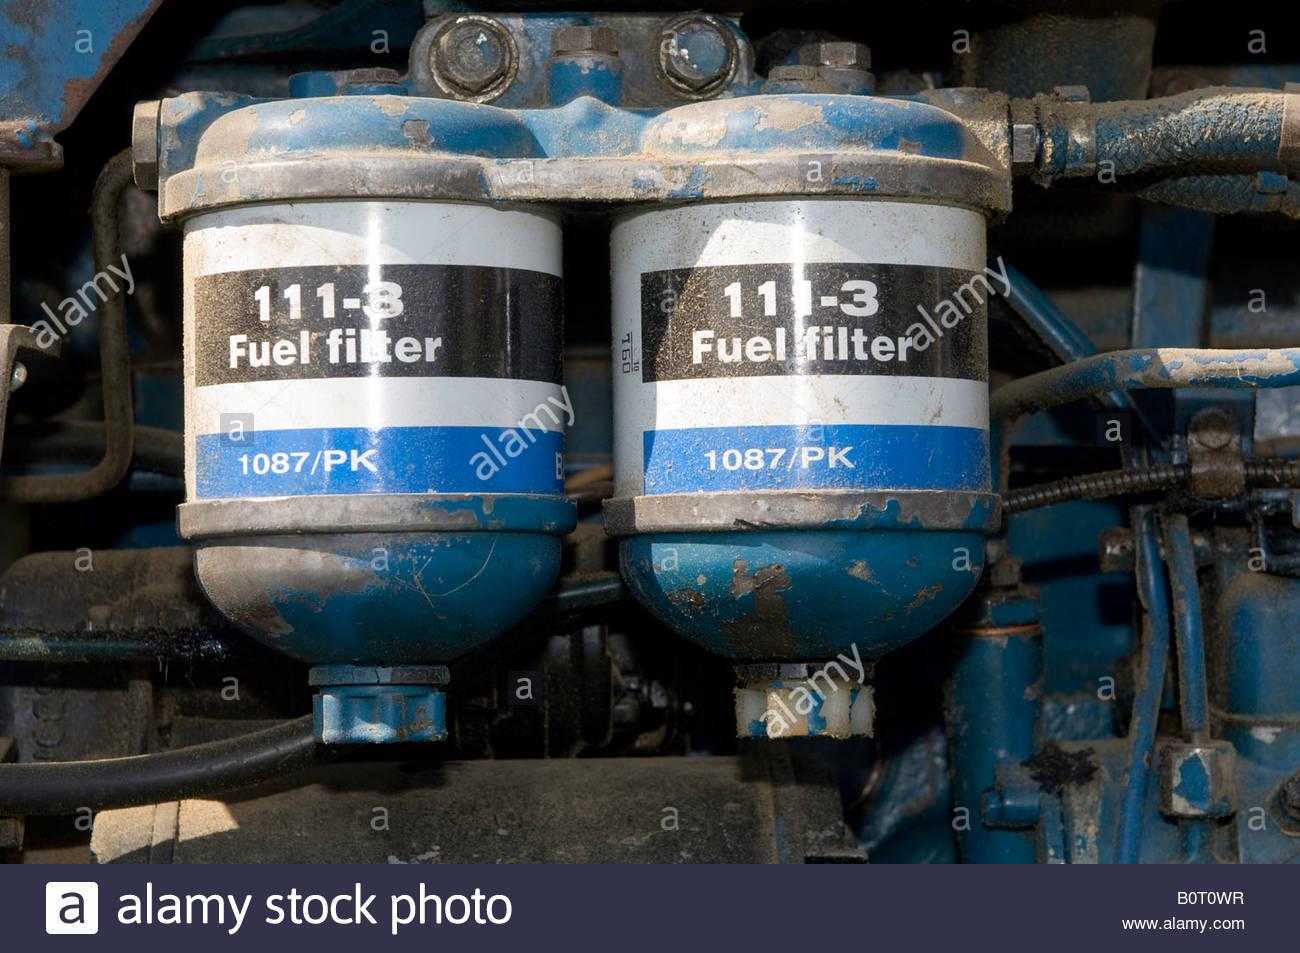 ZZ_7828] Ford Tractor Fuel Filters Wiring DiagramOper Kicep Sianu Ittab Numap Mohammedshrine Librar Wiring 101